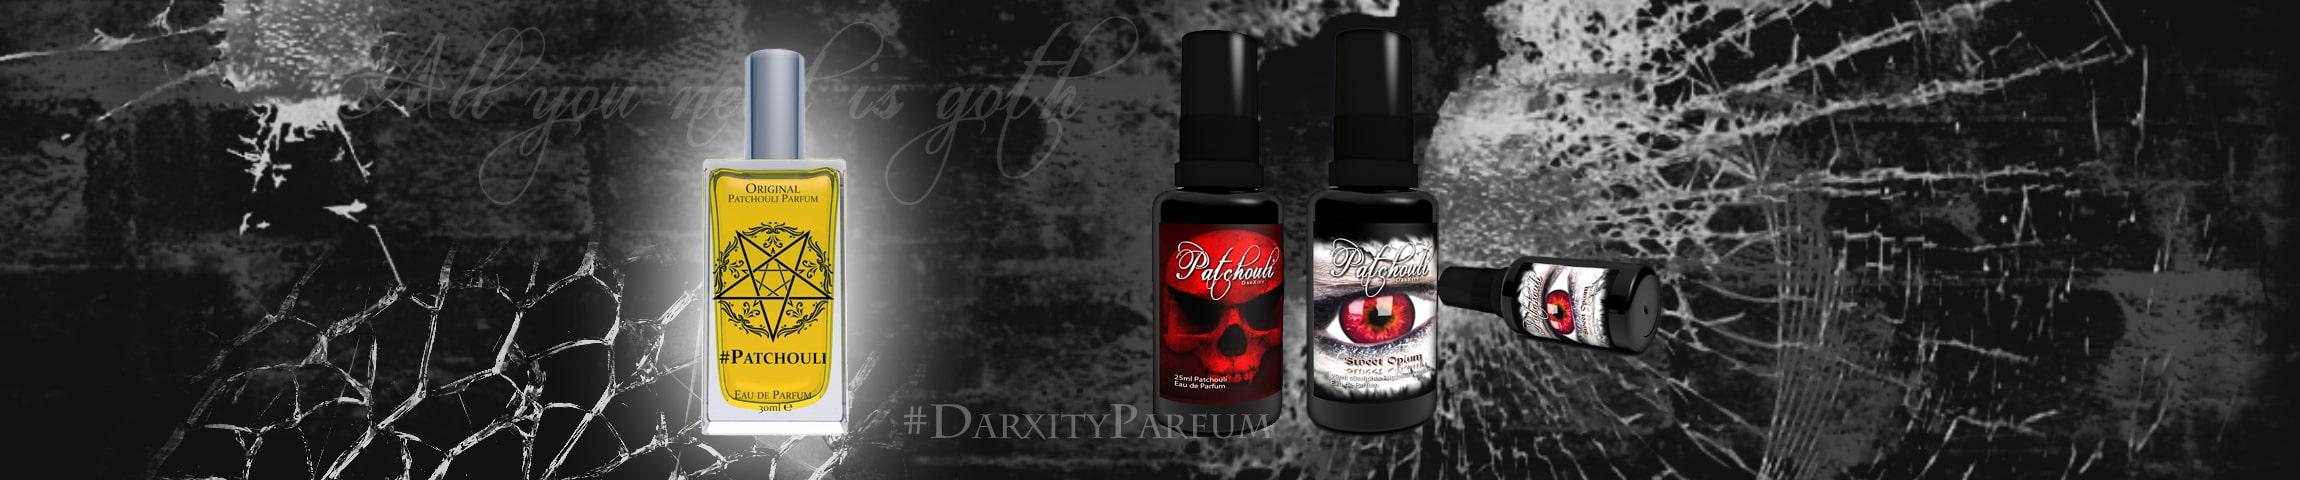 Patchouli Parfum Exklusiv bei uns